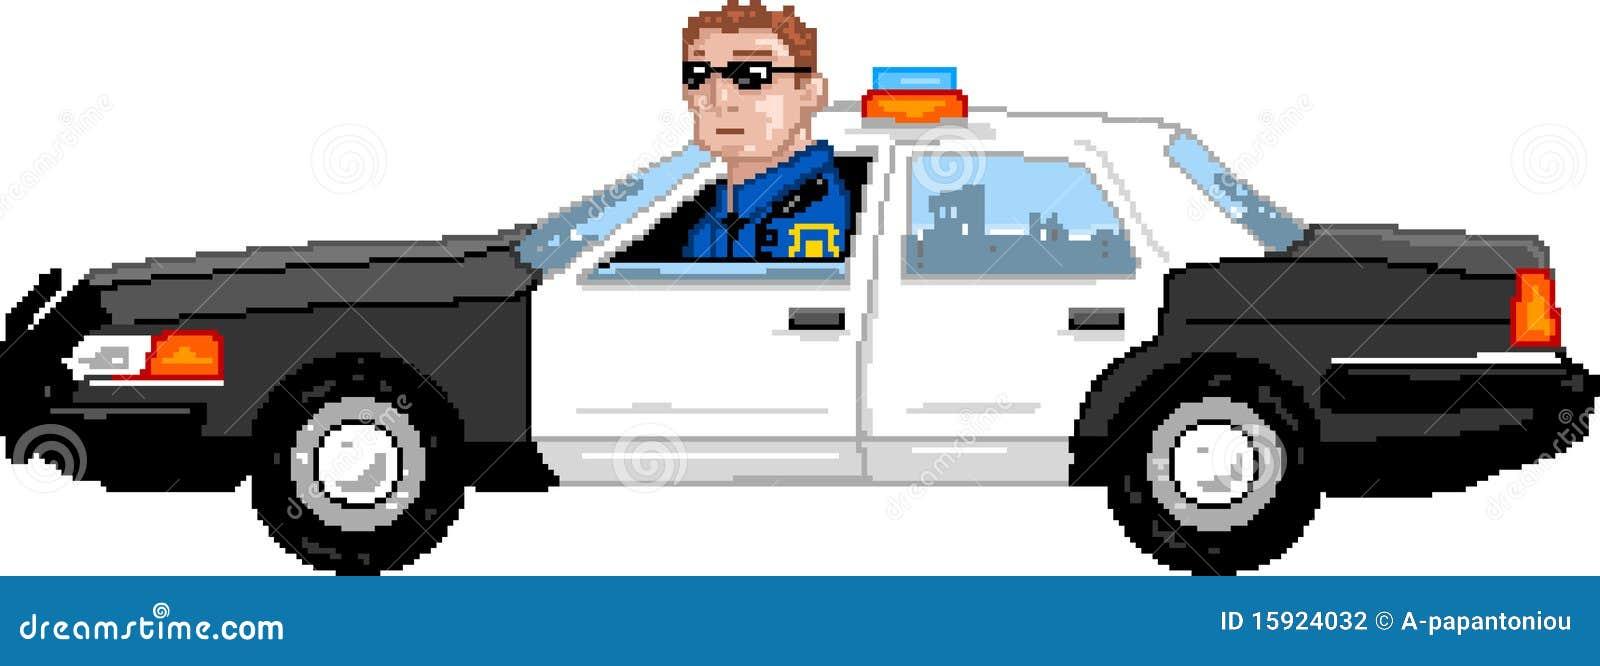 Pixelart Véhicule De Police Illustration De Vecteur